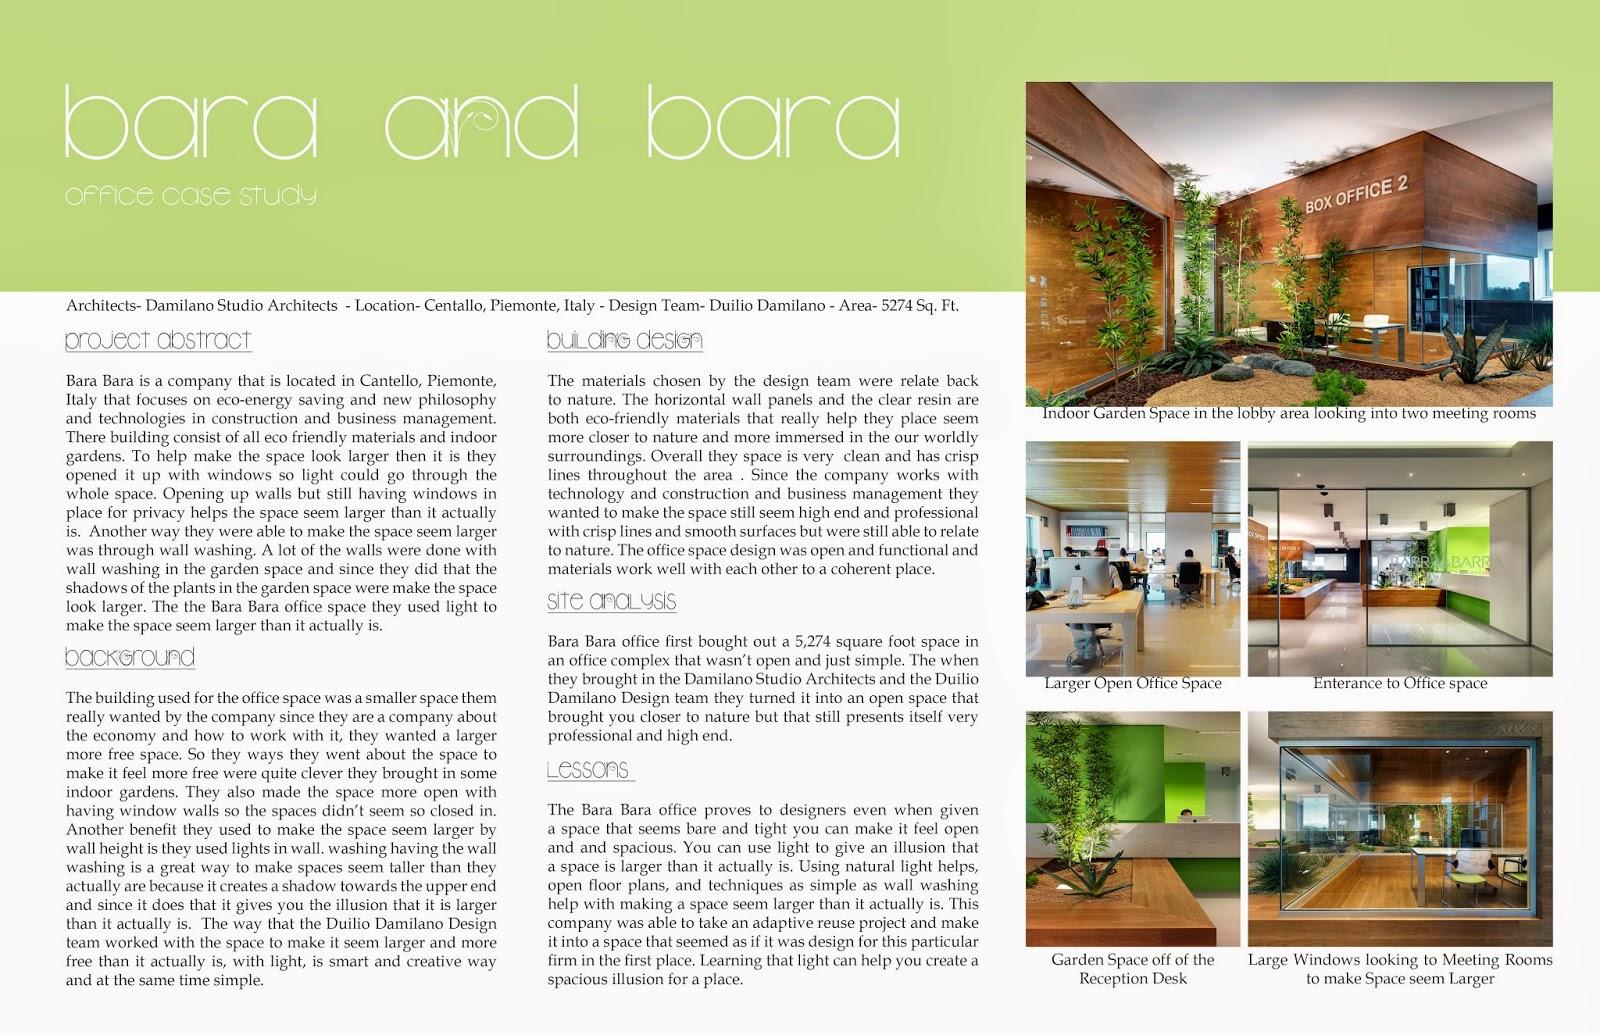 Michelle Hanna Interior Design Portfolio Office Space Case Study